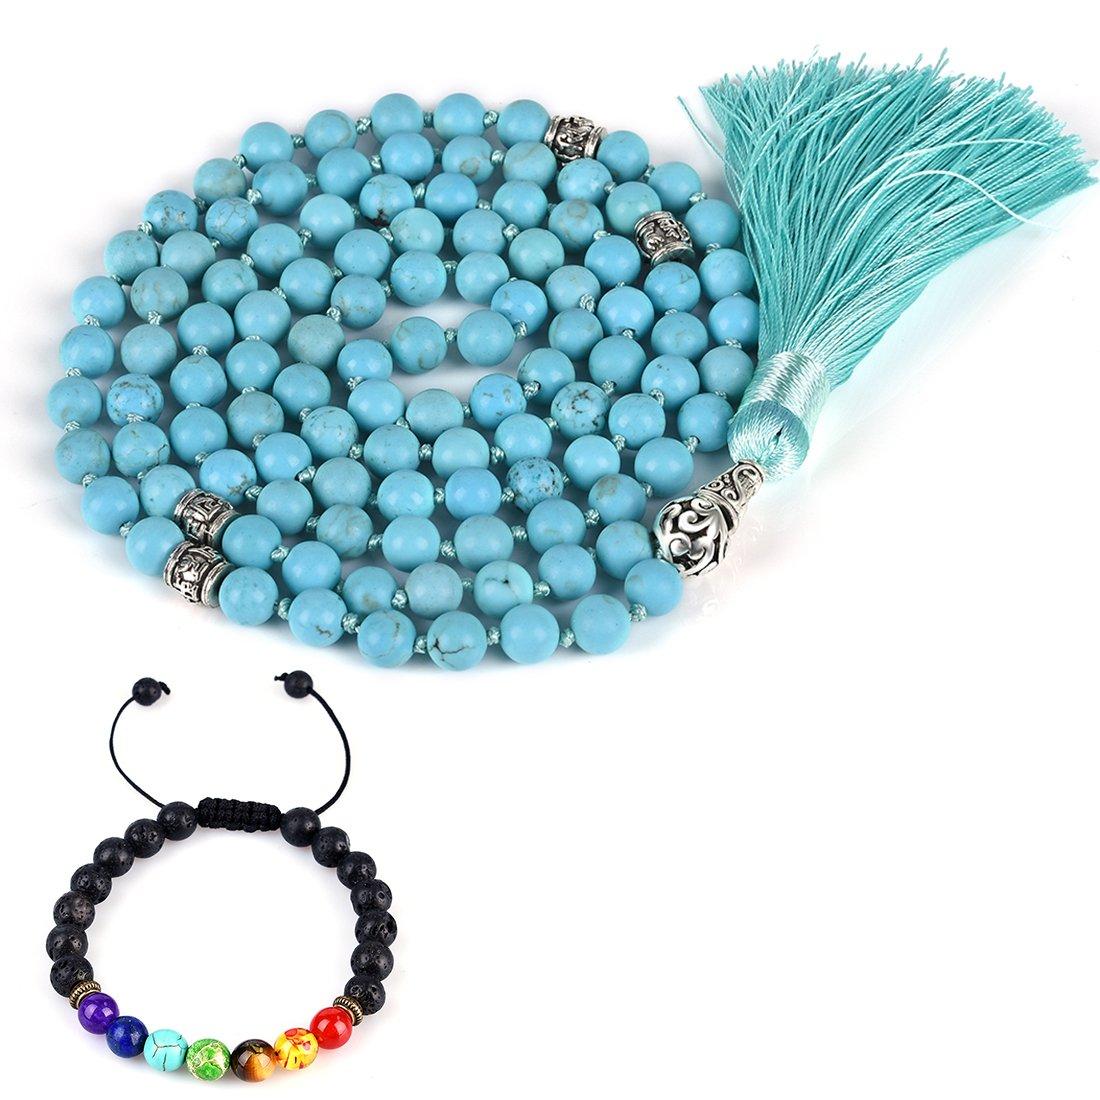 CAT EYE JEWELS 8mm Mala Beads Necklace Yoga Meditation 108 Hand Knotted Turquoise Japa Mala Buddhist Prayer Beads Tassel Necklace Healing Lava Rock Beads Diffuser Bracelet